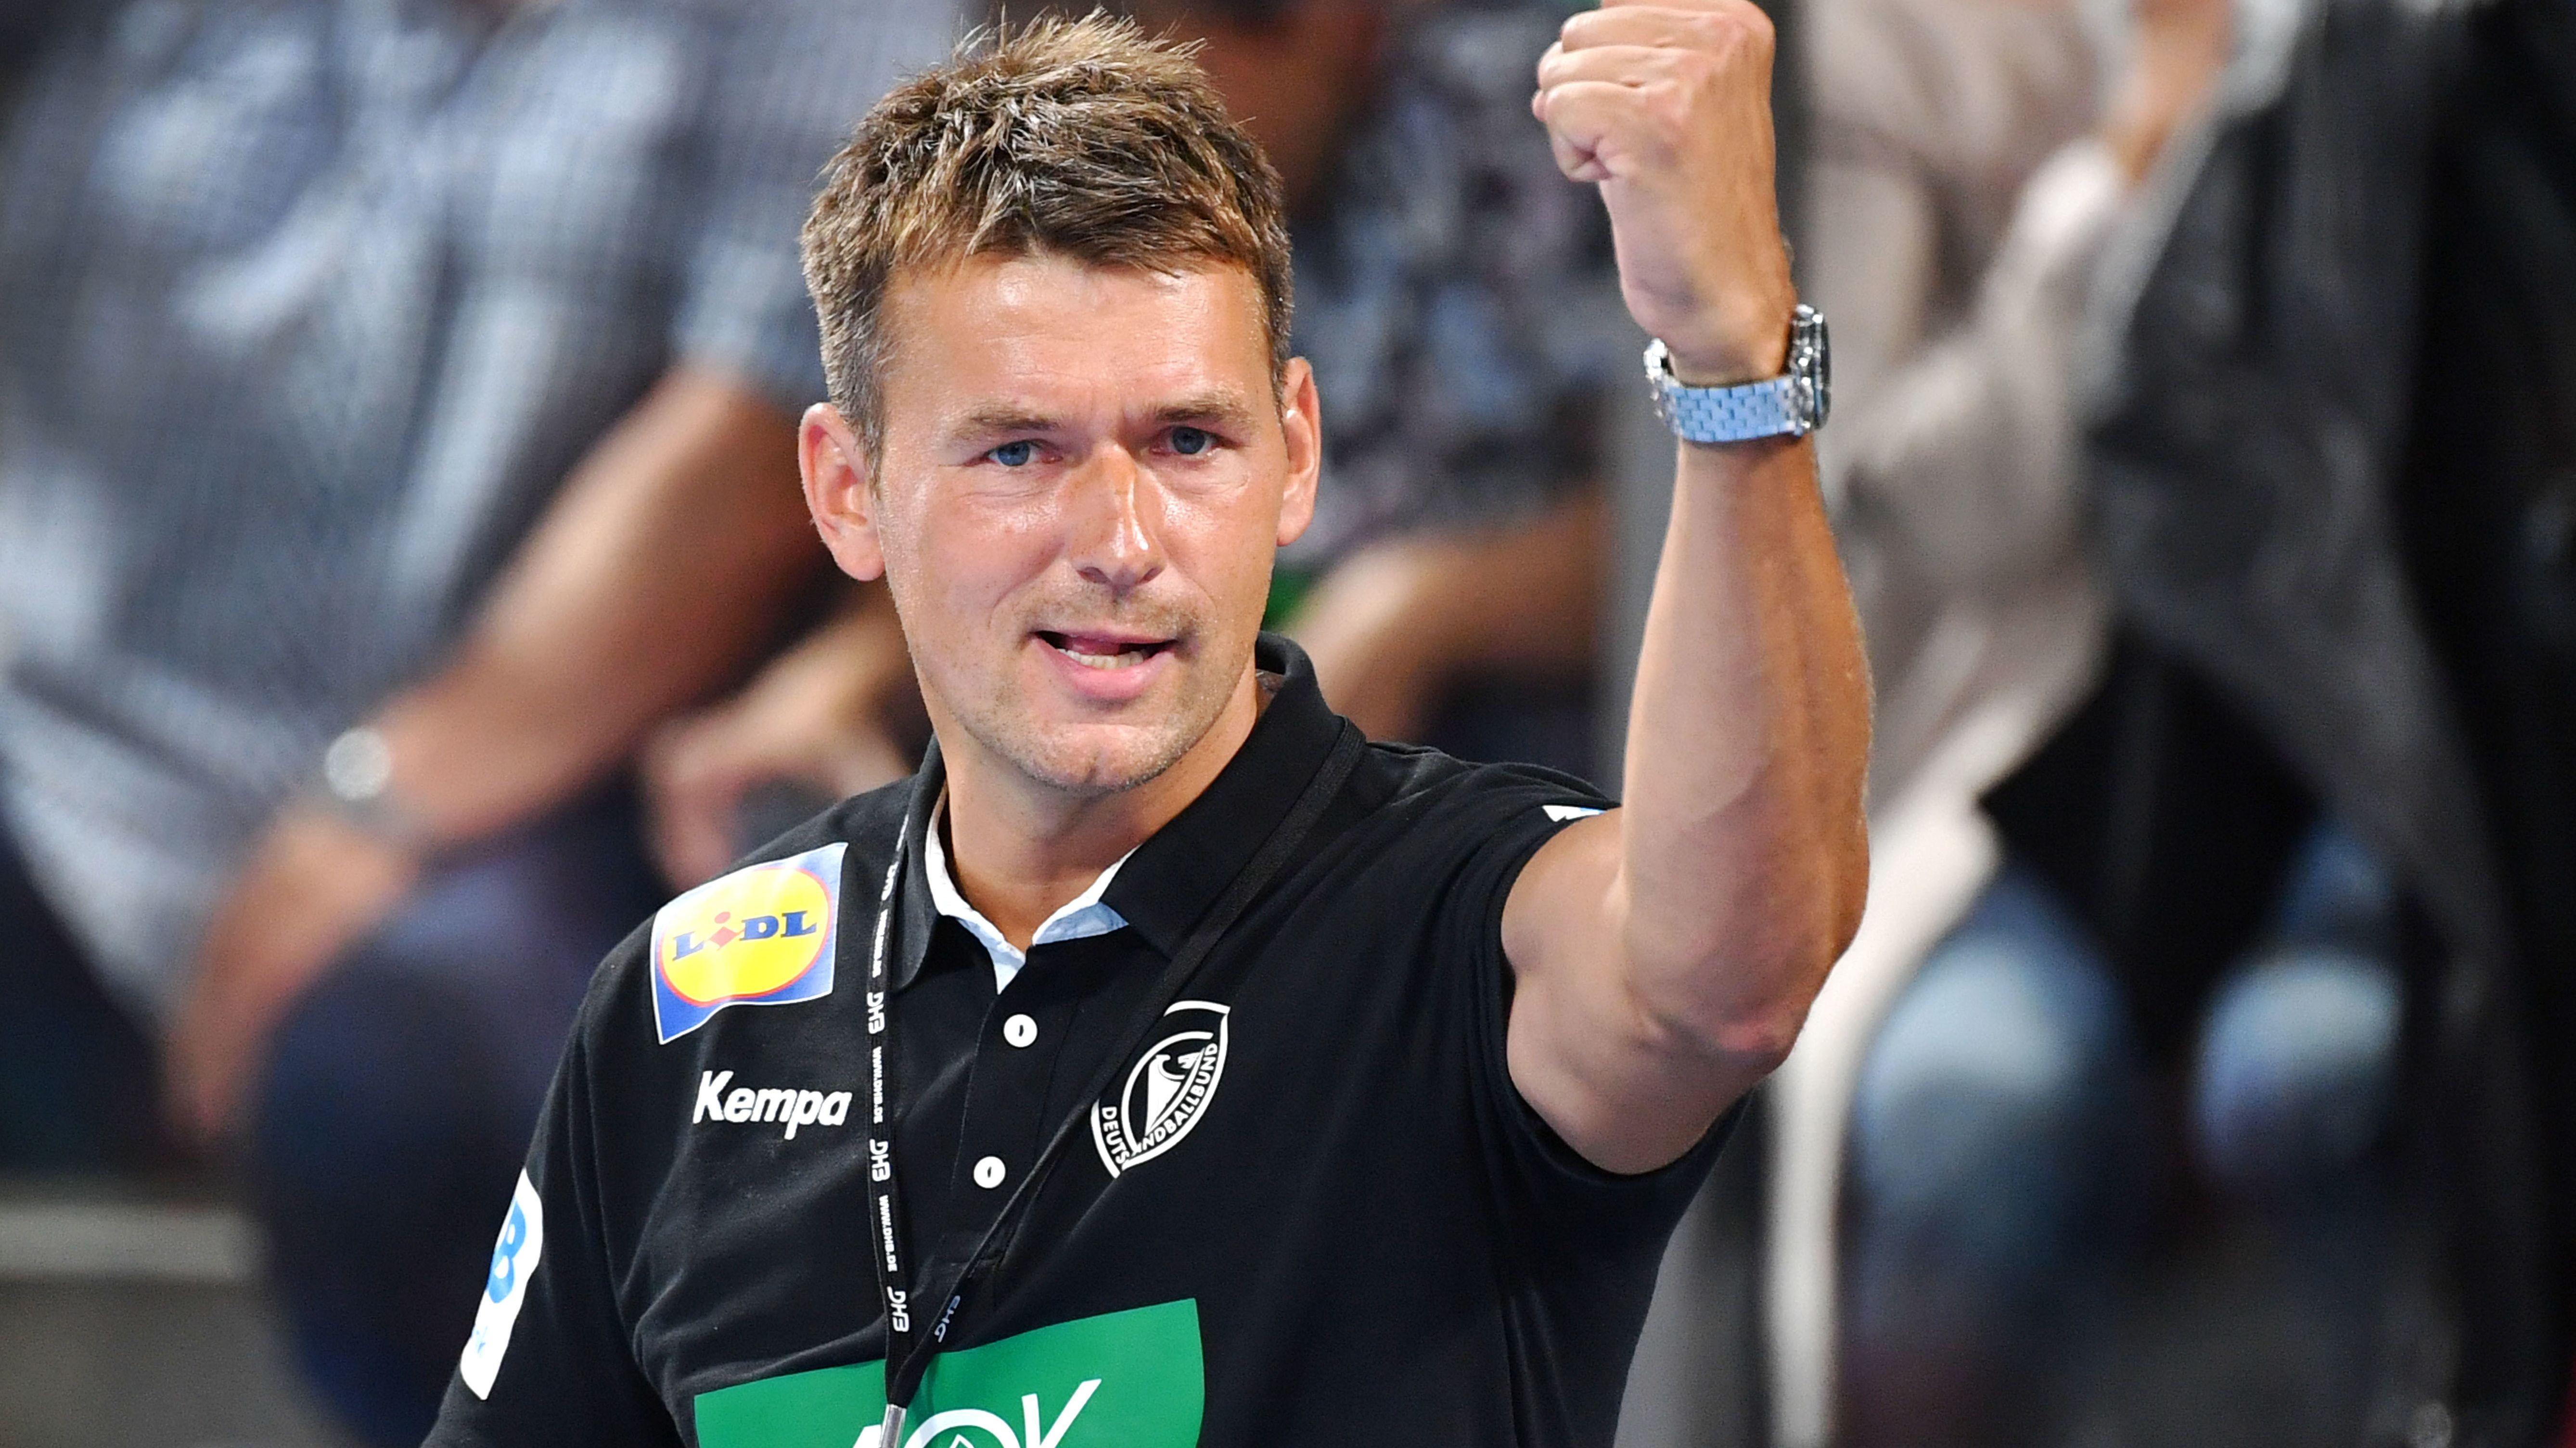 Bundestrainer Christian Prokop